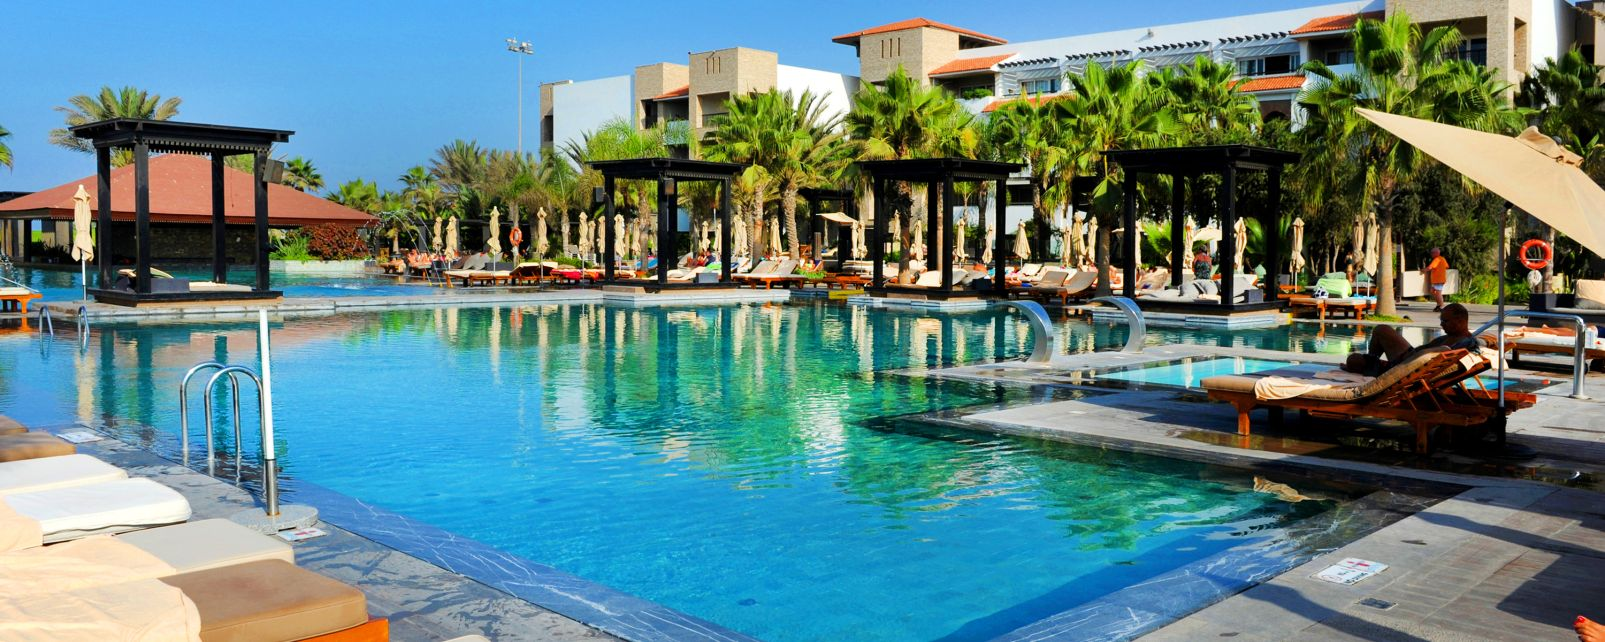 Hôtel Riu Palace Tikida Agadir